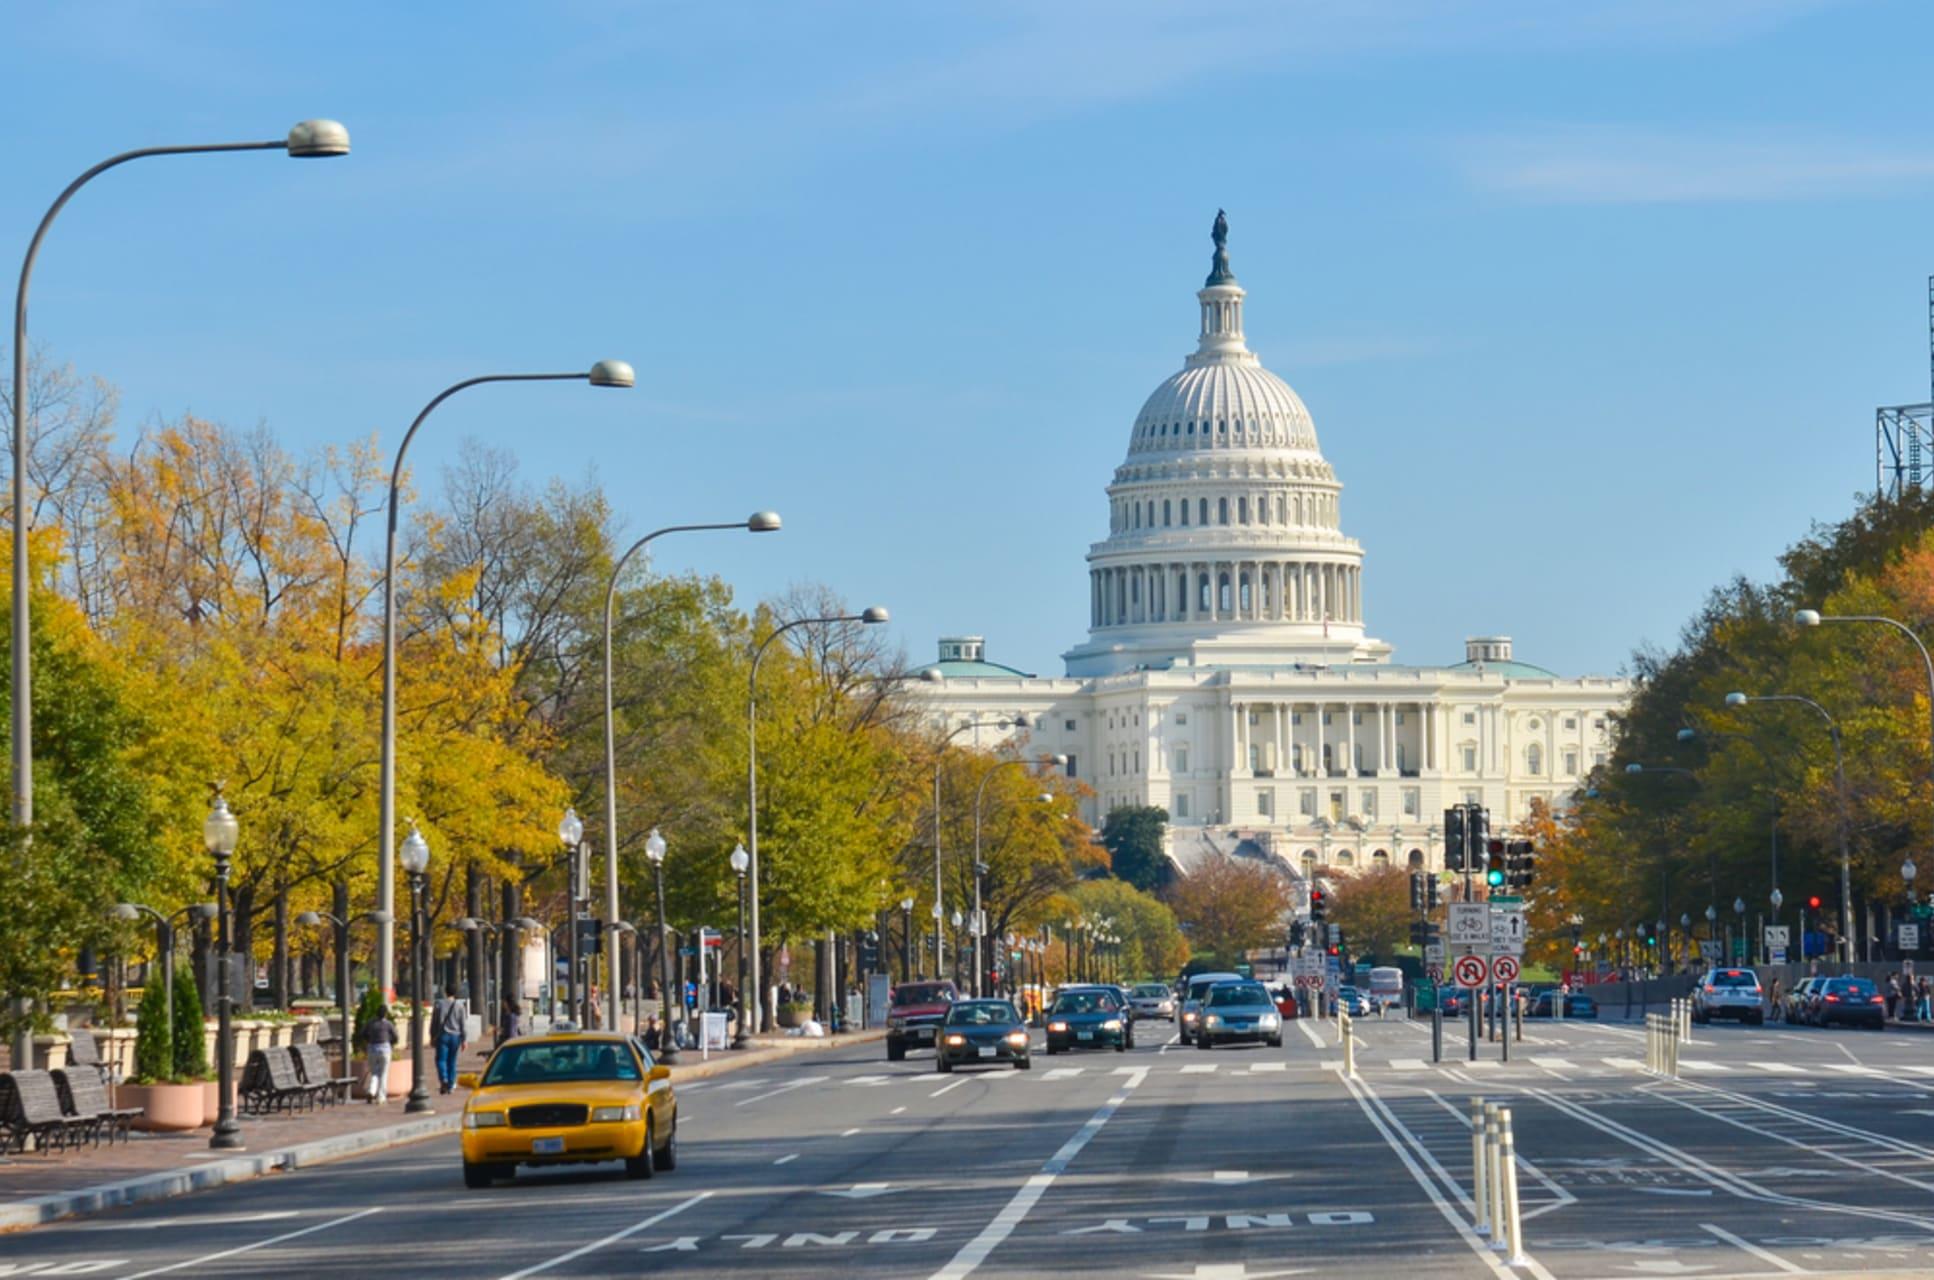 Washington D.C. - Pennsylvania Avenue - America's Main Street - Part 1 - US Navy Memorial to Ford's Theatre